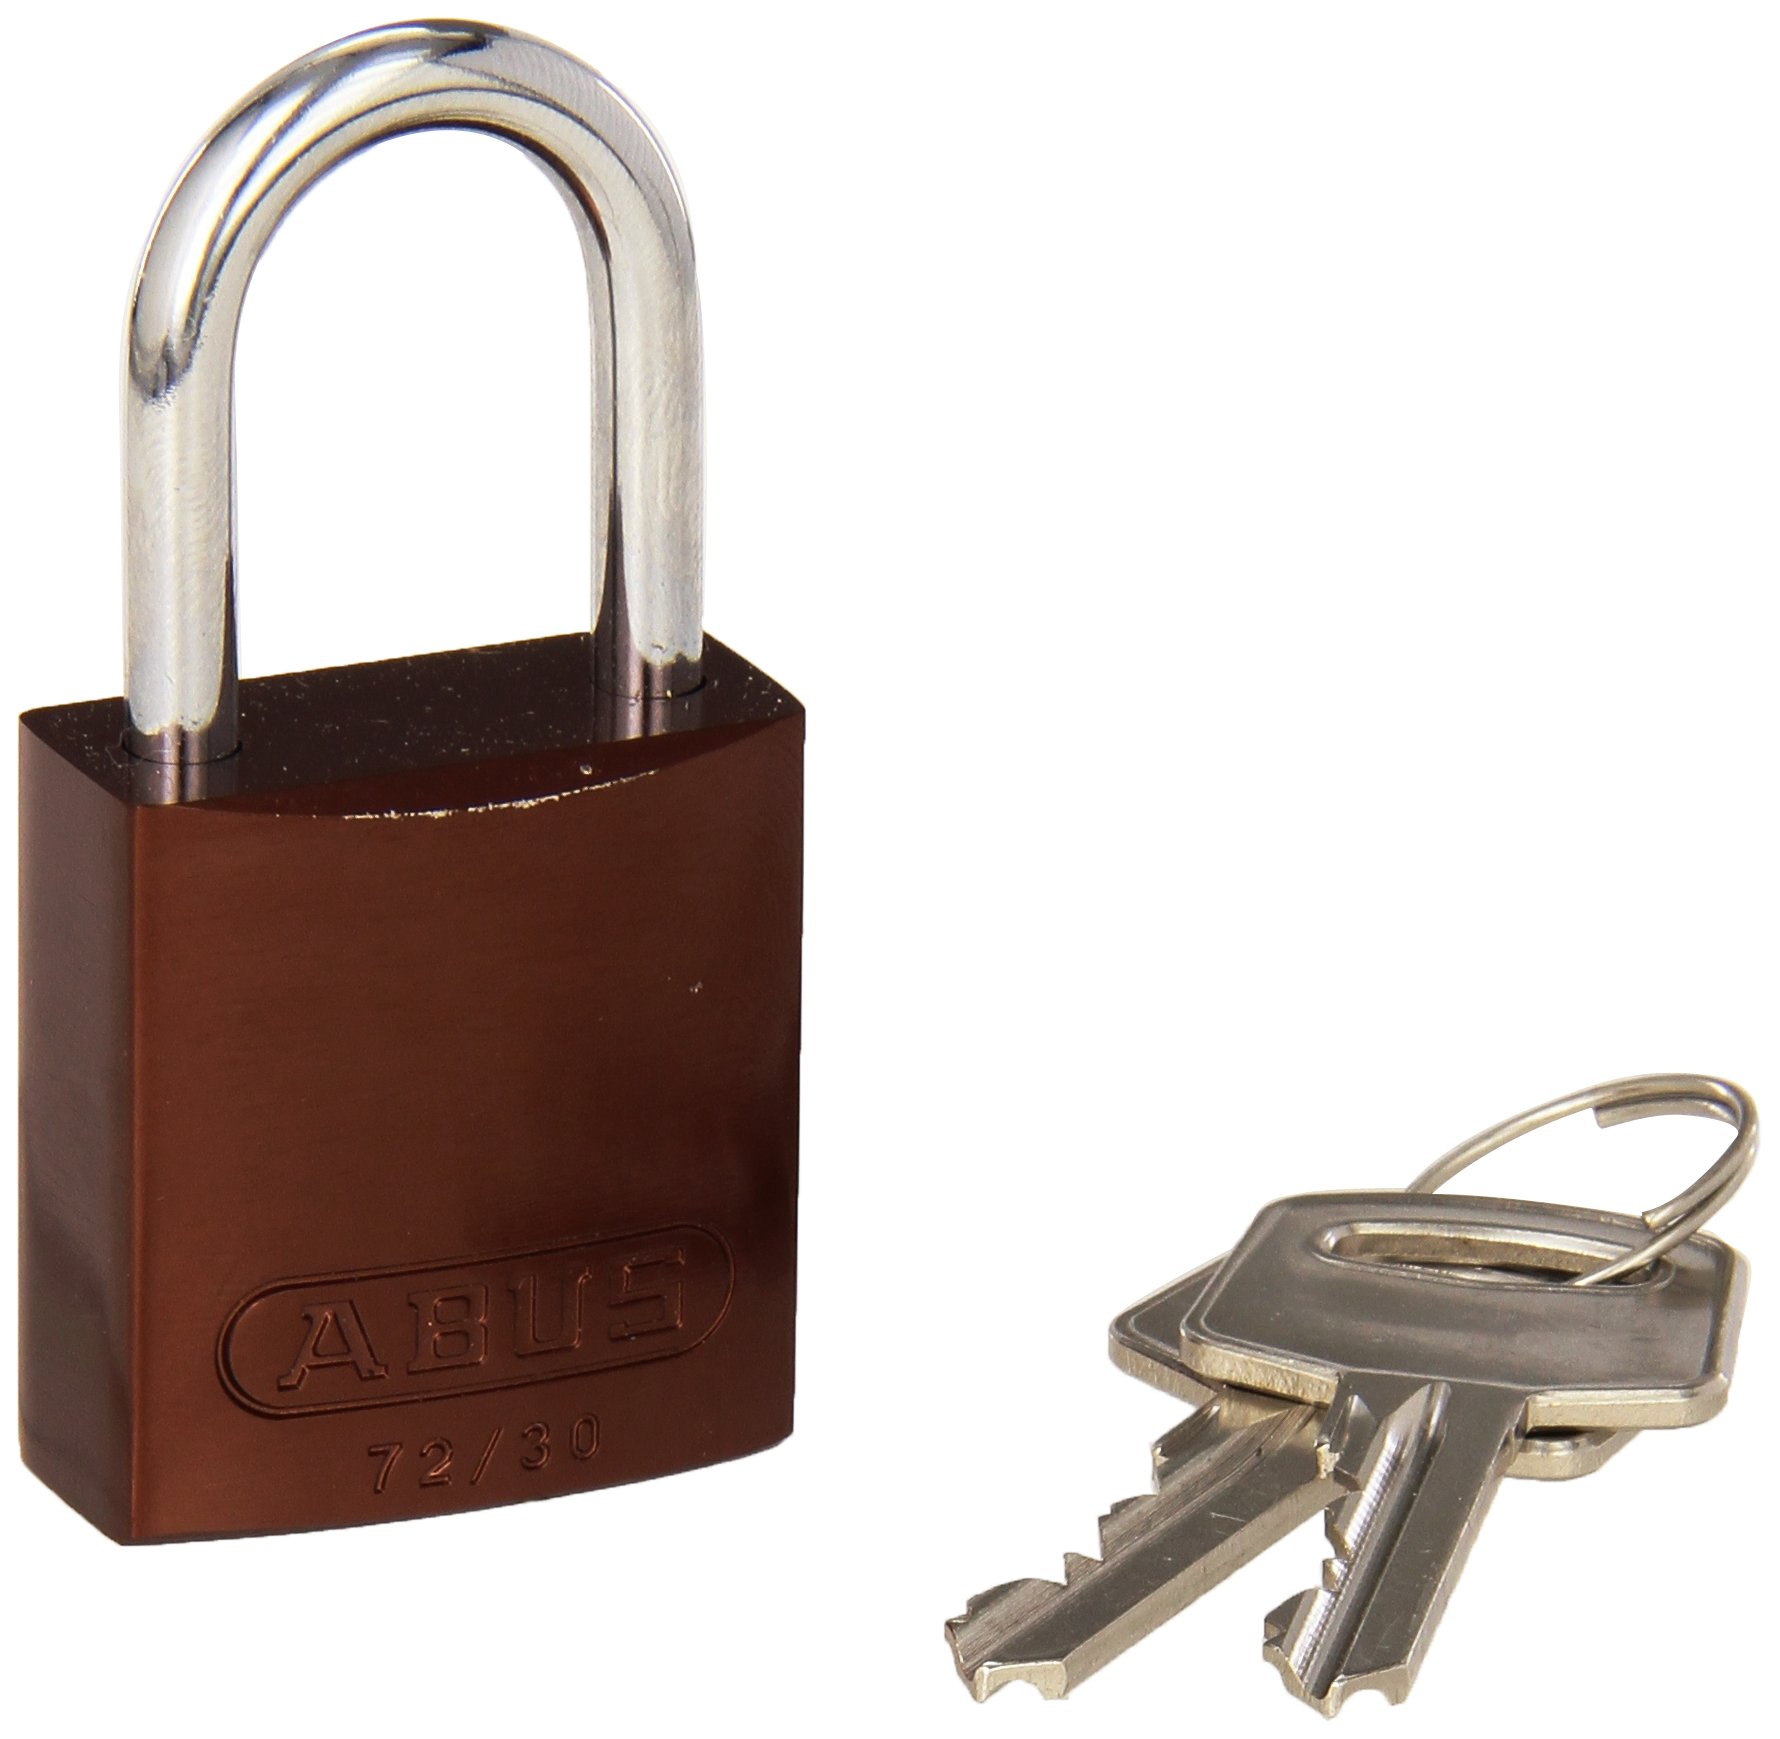 Brady 133294 Keyed Padlock, Alike Key, Aluminum (Pack of 6)